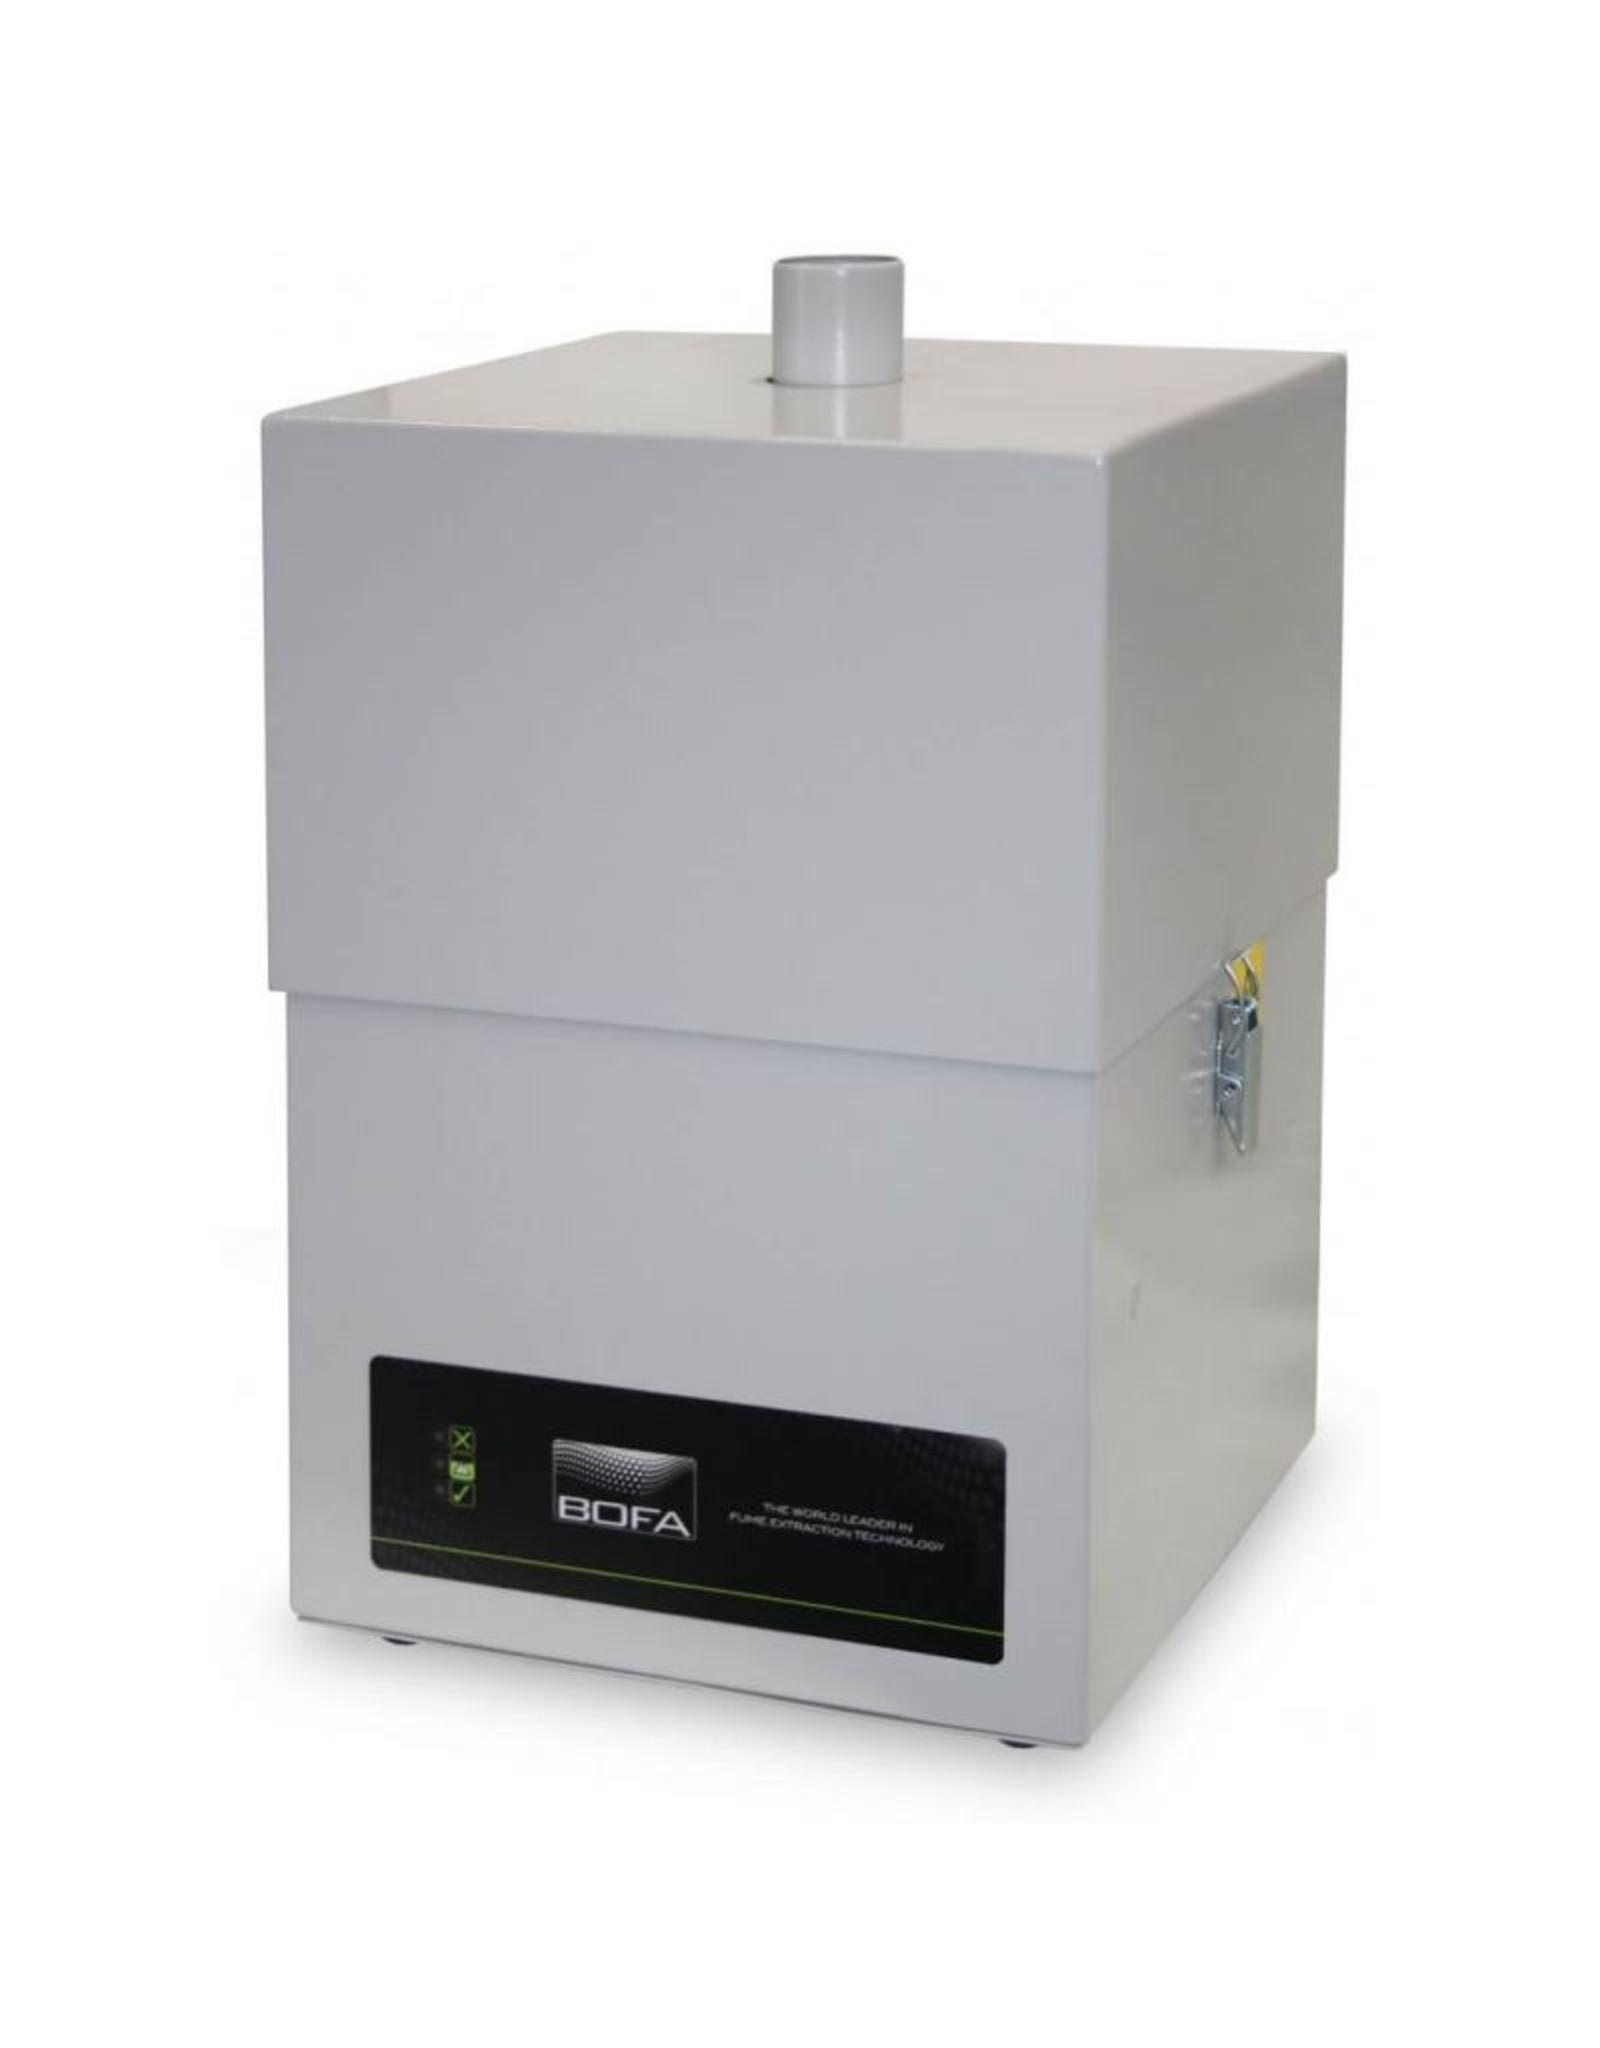 Metaquip BOFA ACCESS industrial air filter